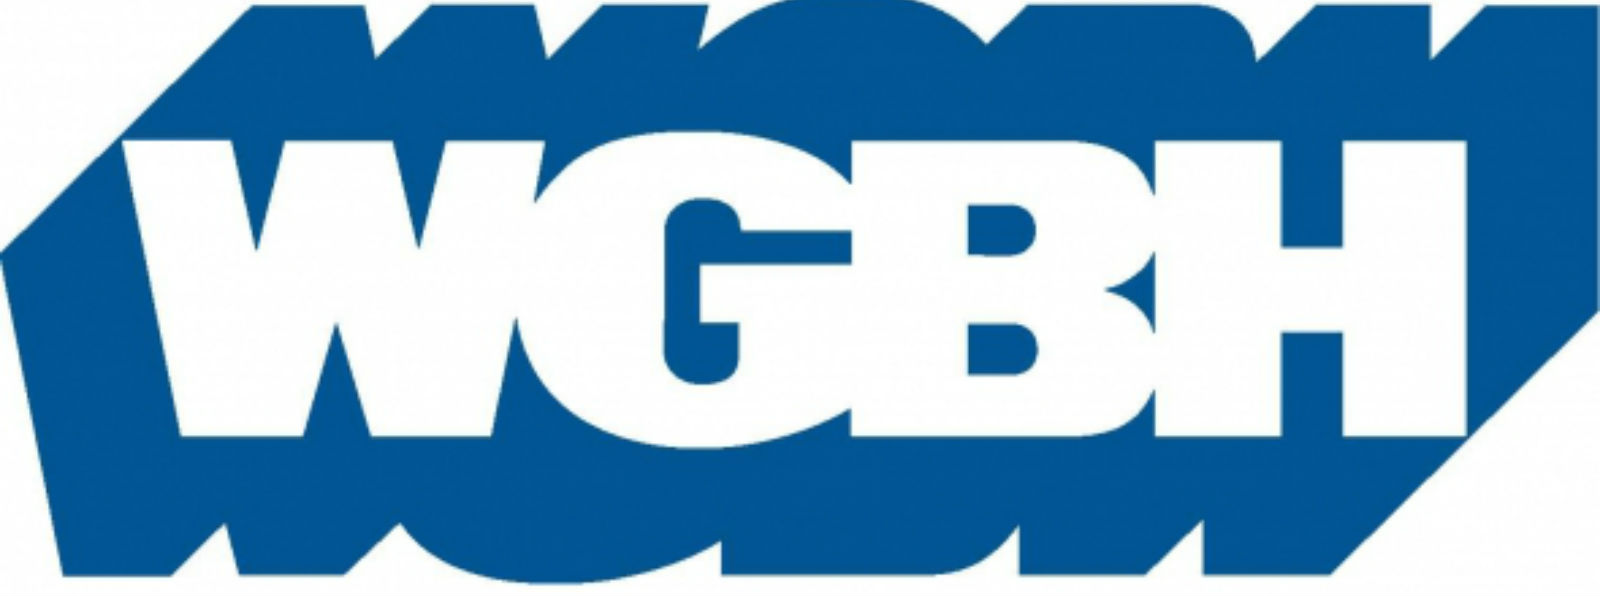 WGBH-Logo-EPS-590x332.jpg